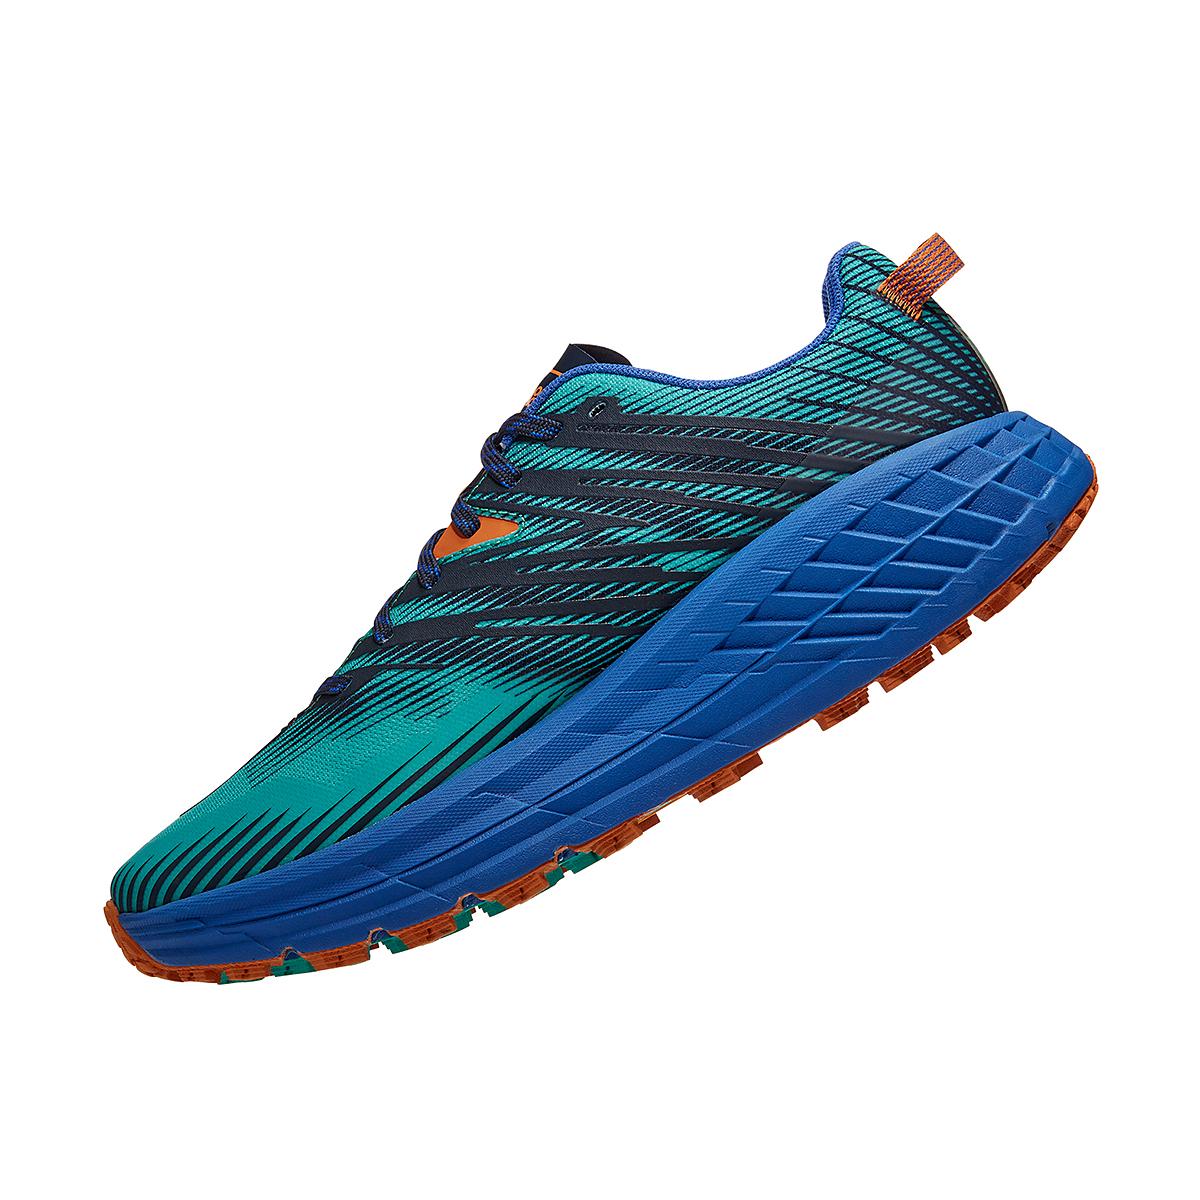 Men's Hoka One One Speedgoat 4 Trail Running Shoe - Color: Atlantis/Dazzling Blue - Size: 7 - Width: Regular, Atlantis/Dazzling Blue, large, image 3